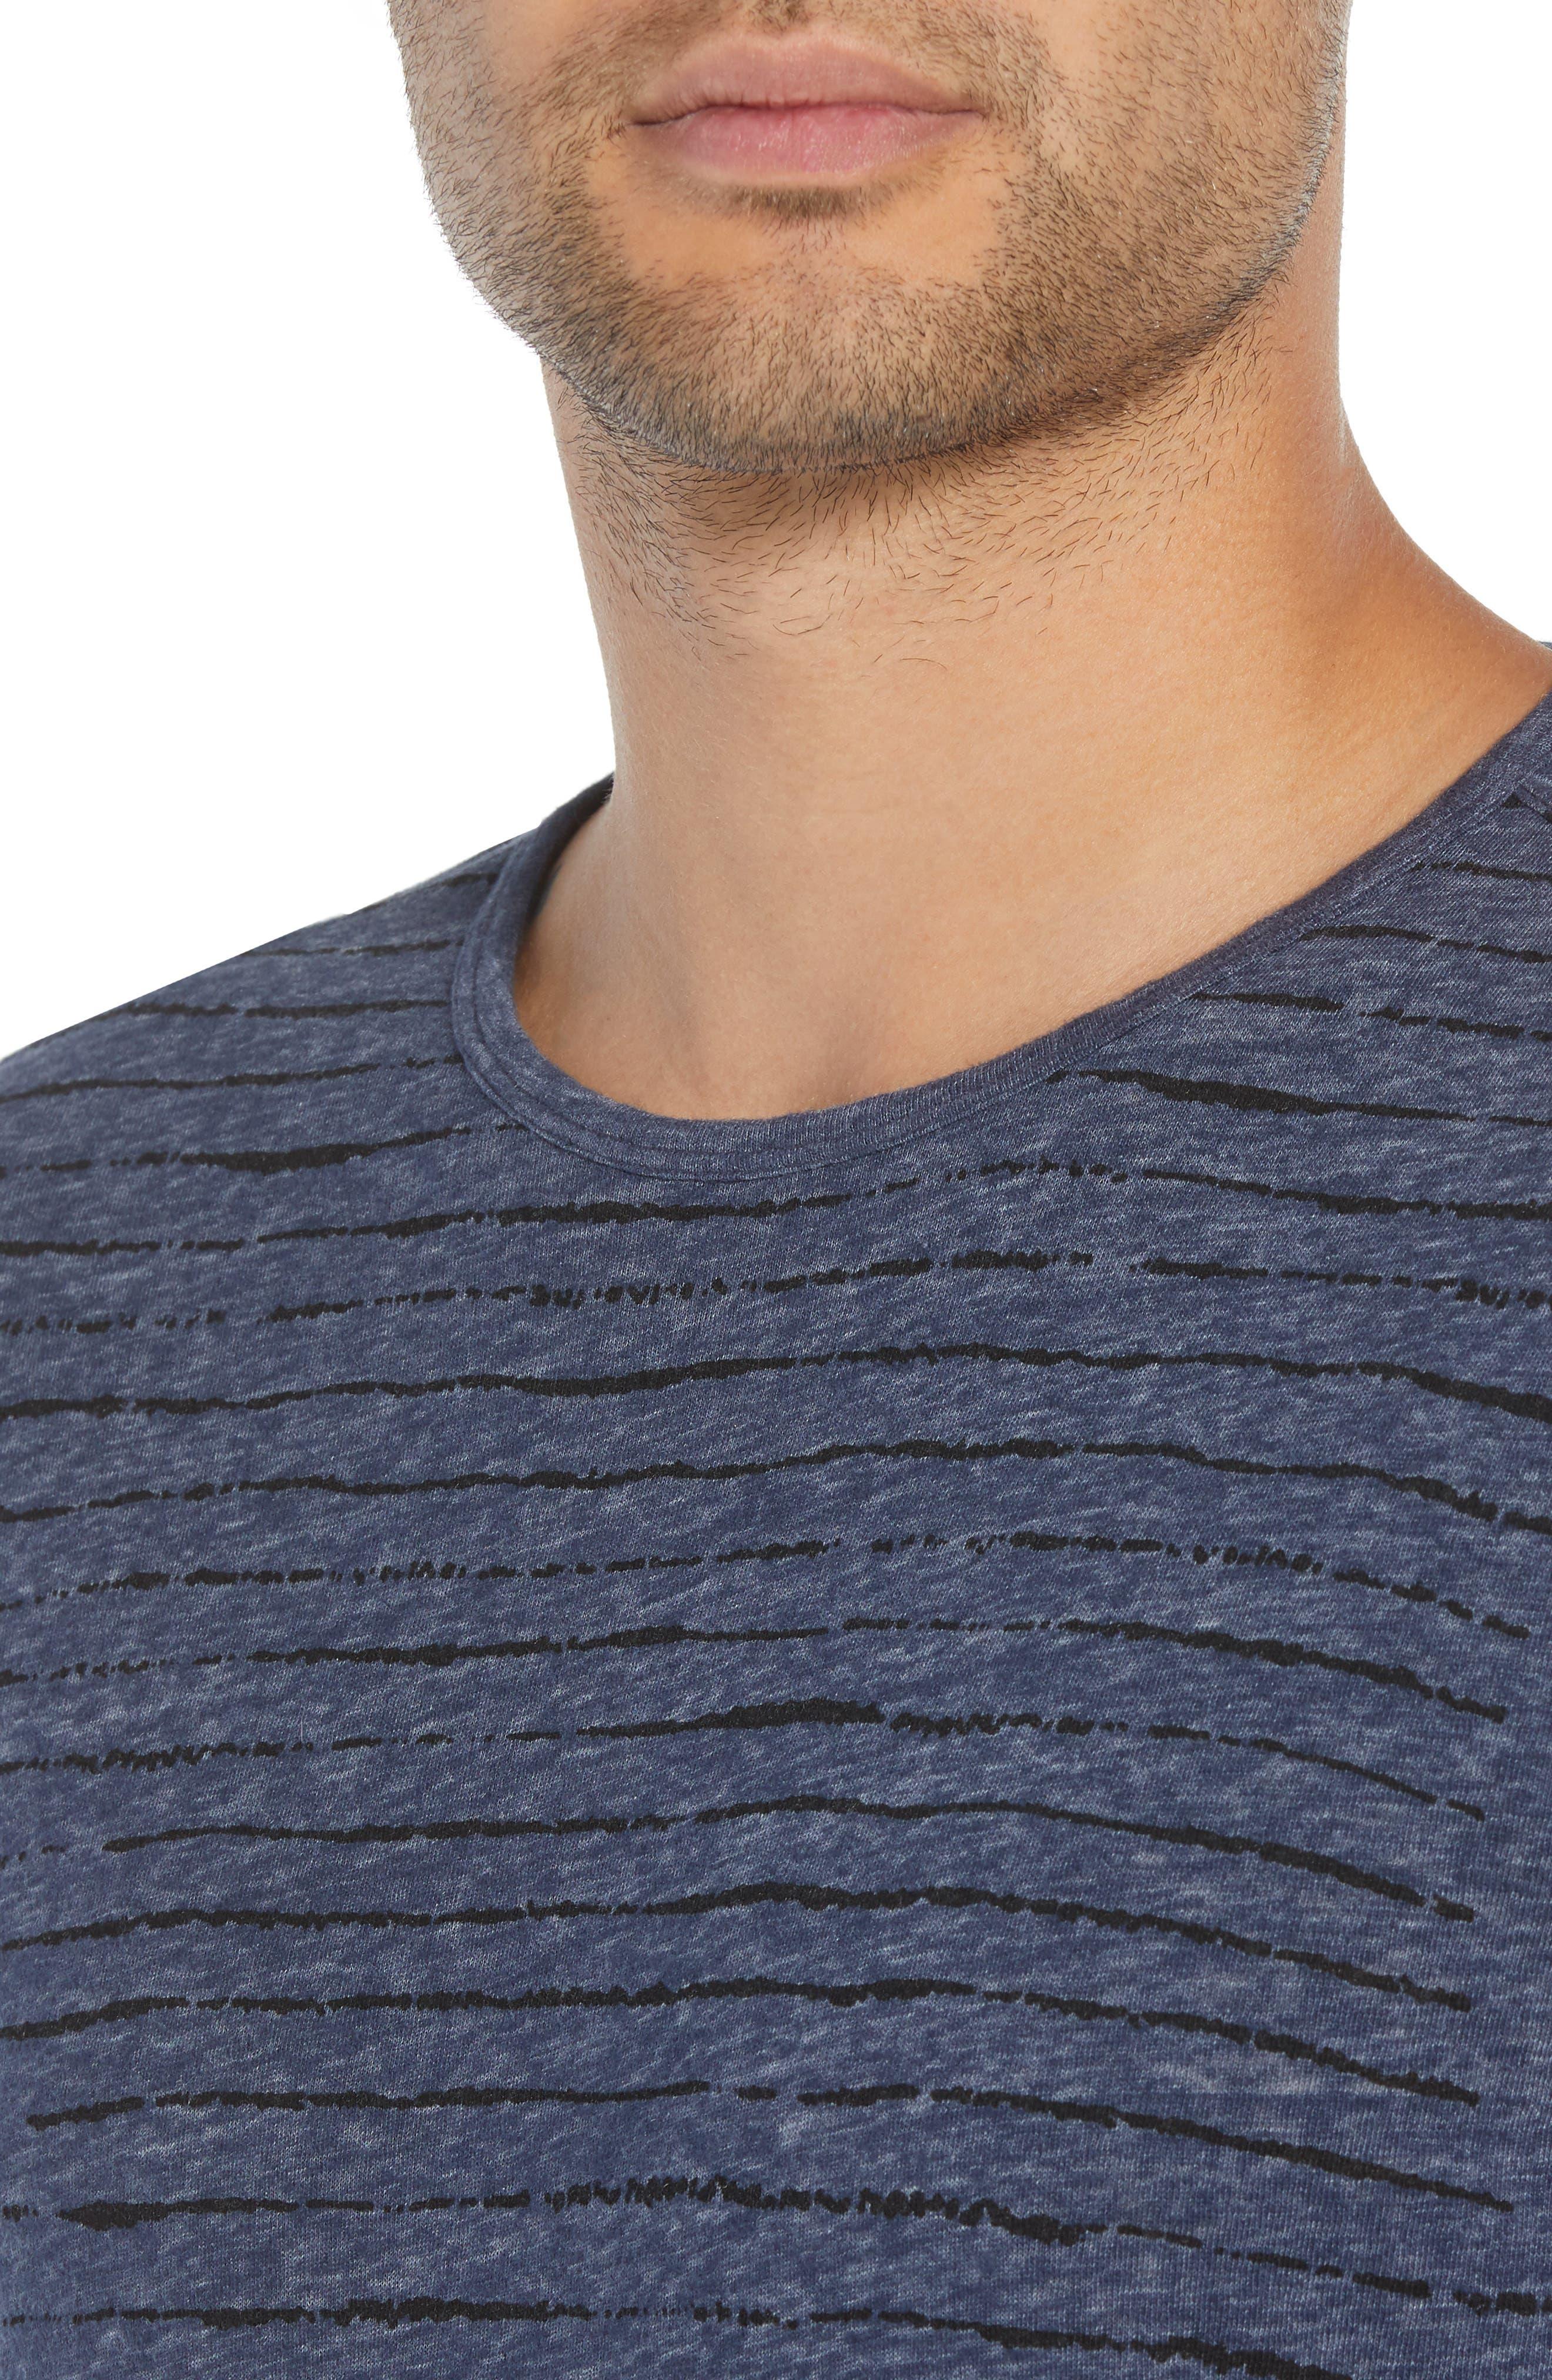 Regular Fit Crewneck Shirt,                             Alternate thumbnail 4, color,                             MIDNIGHT